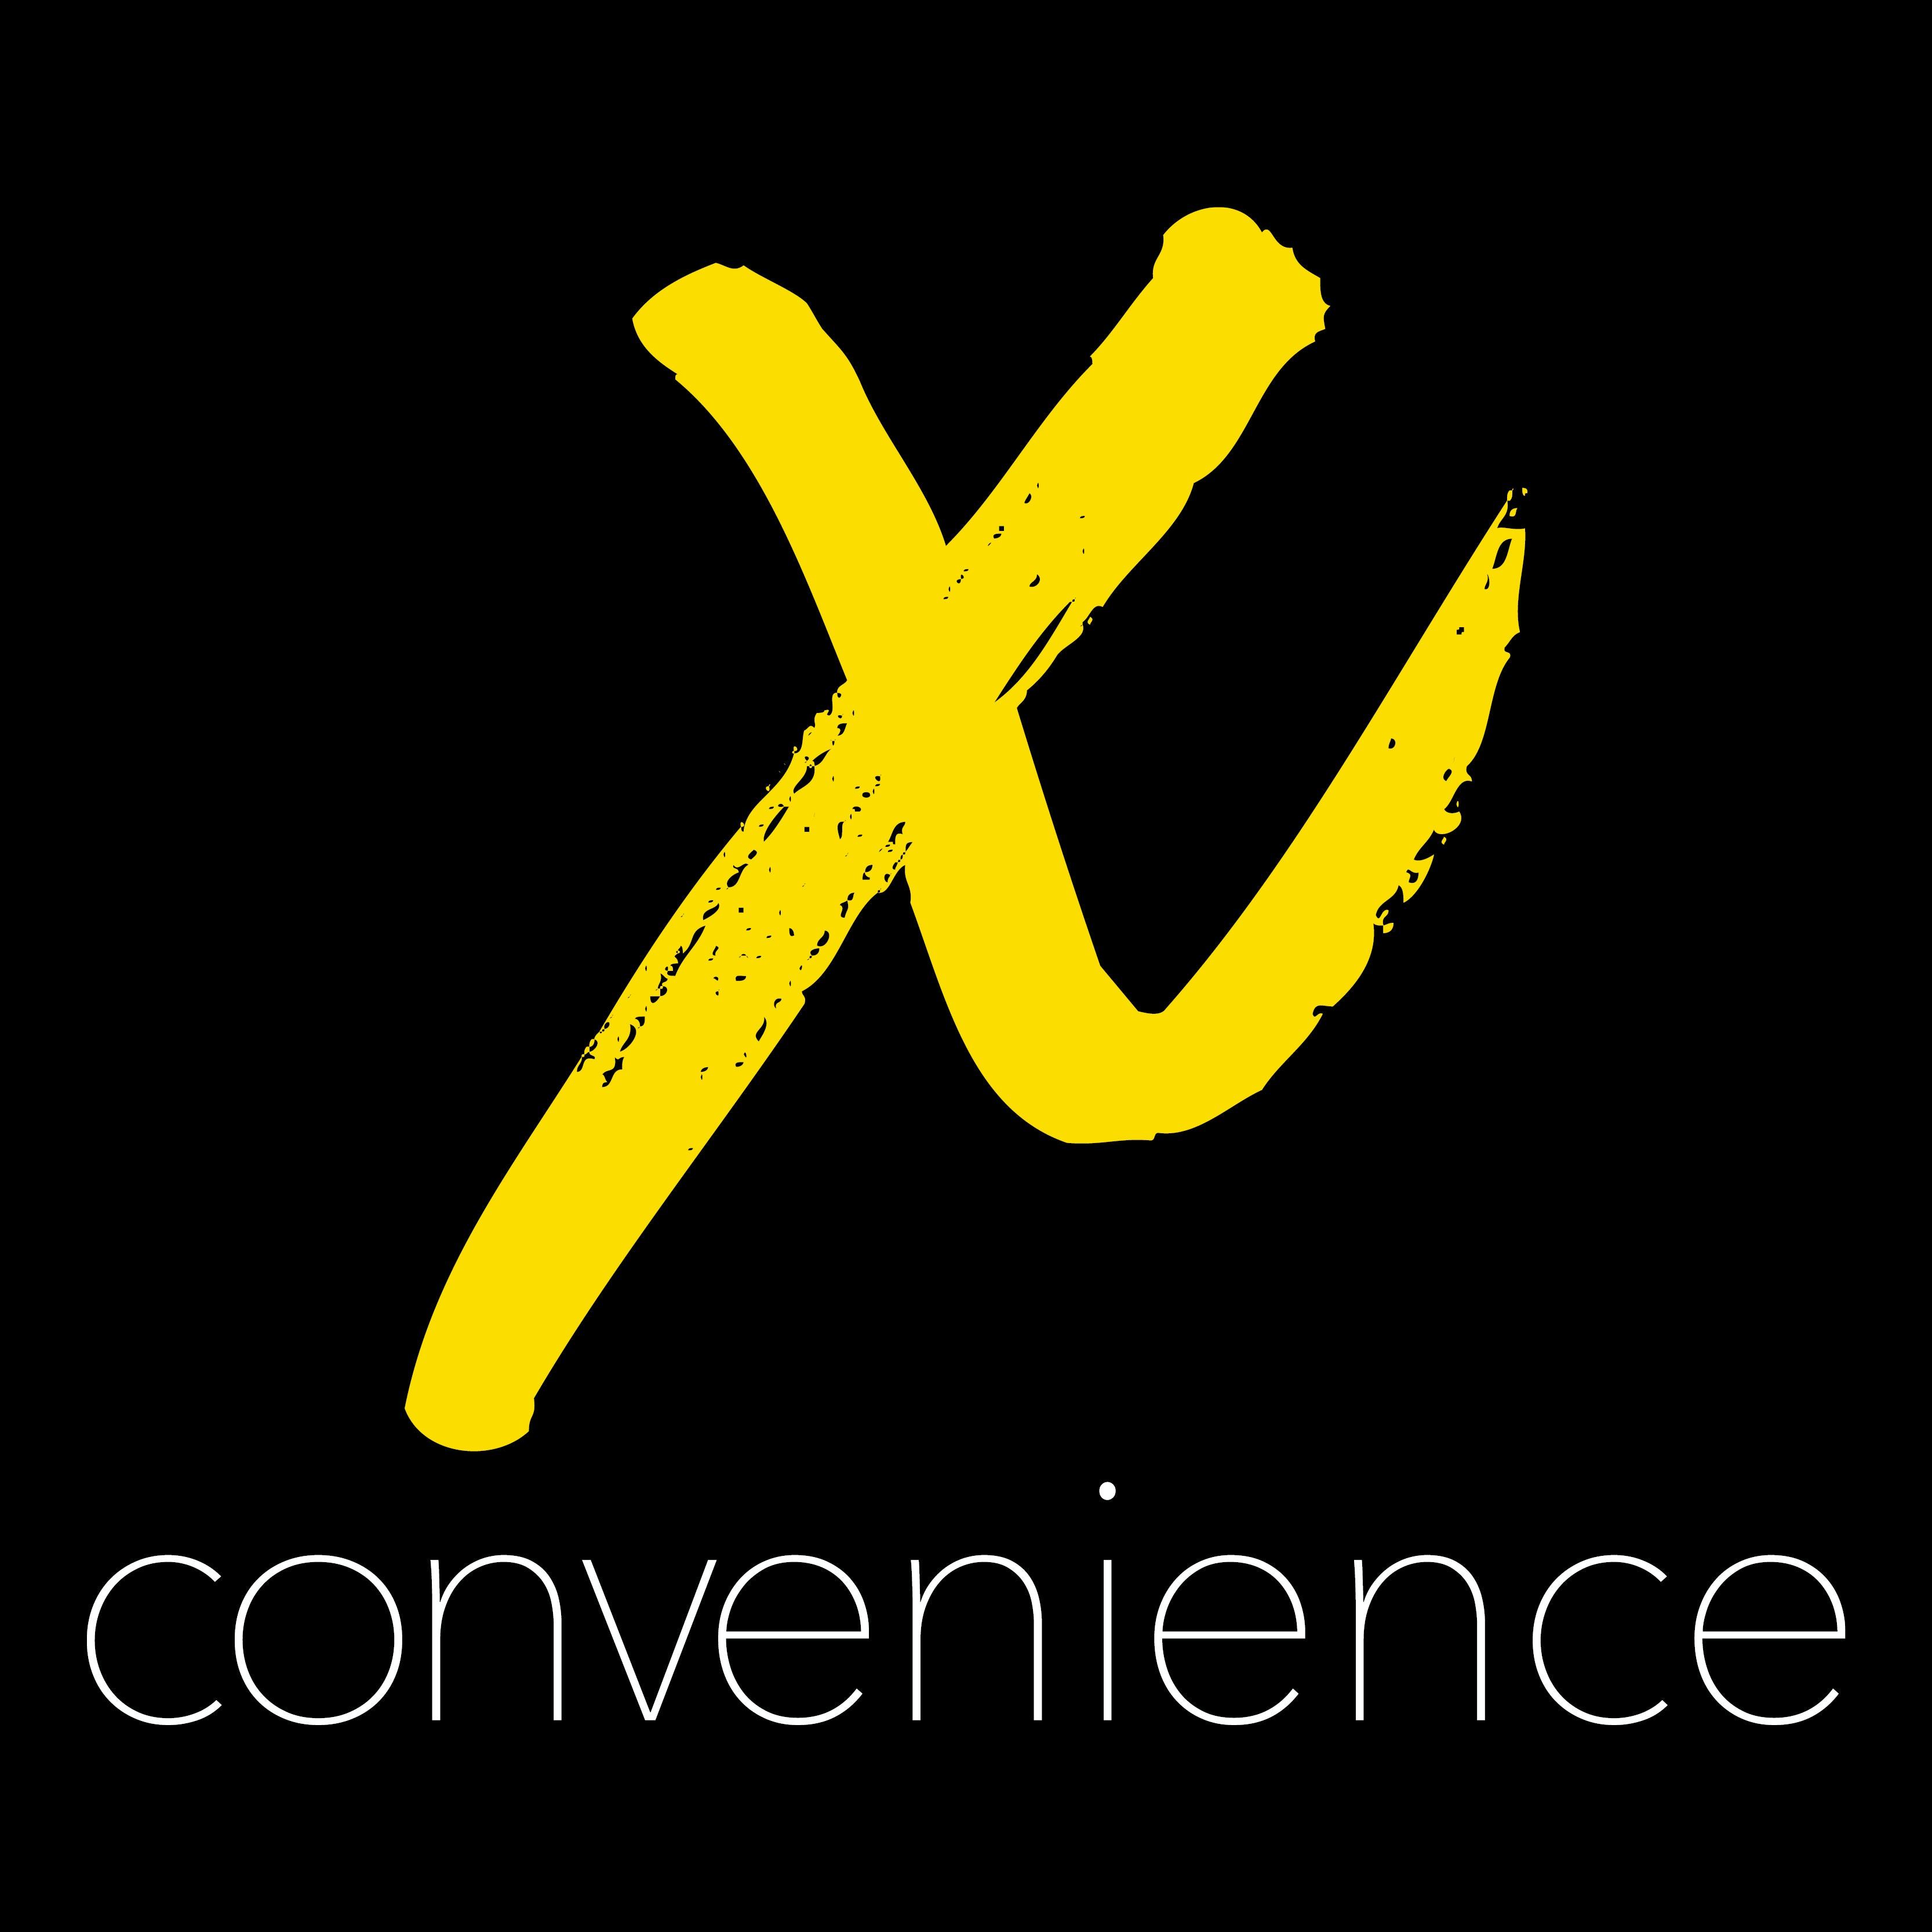 X Convenience